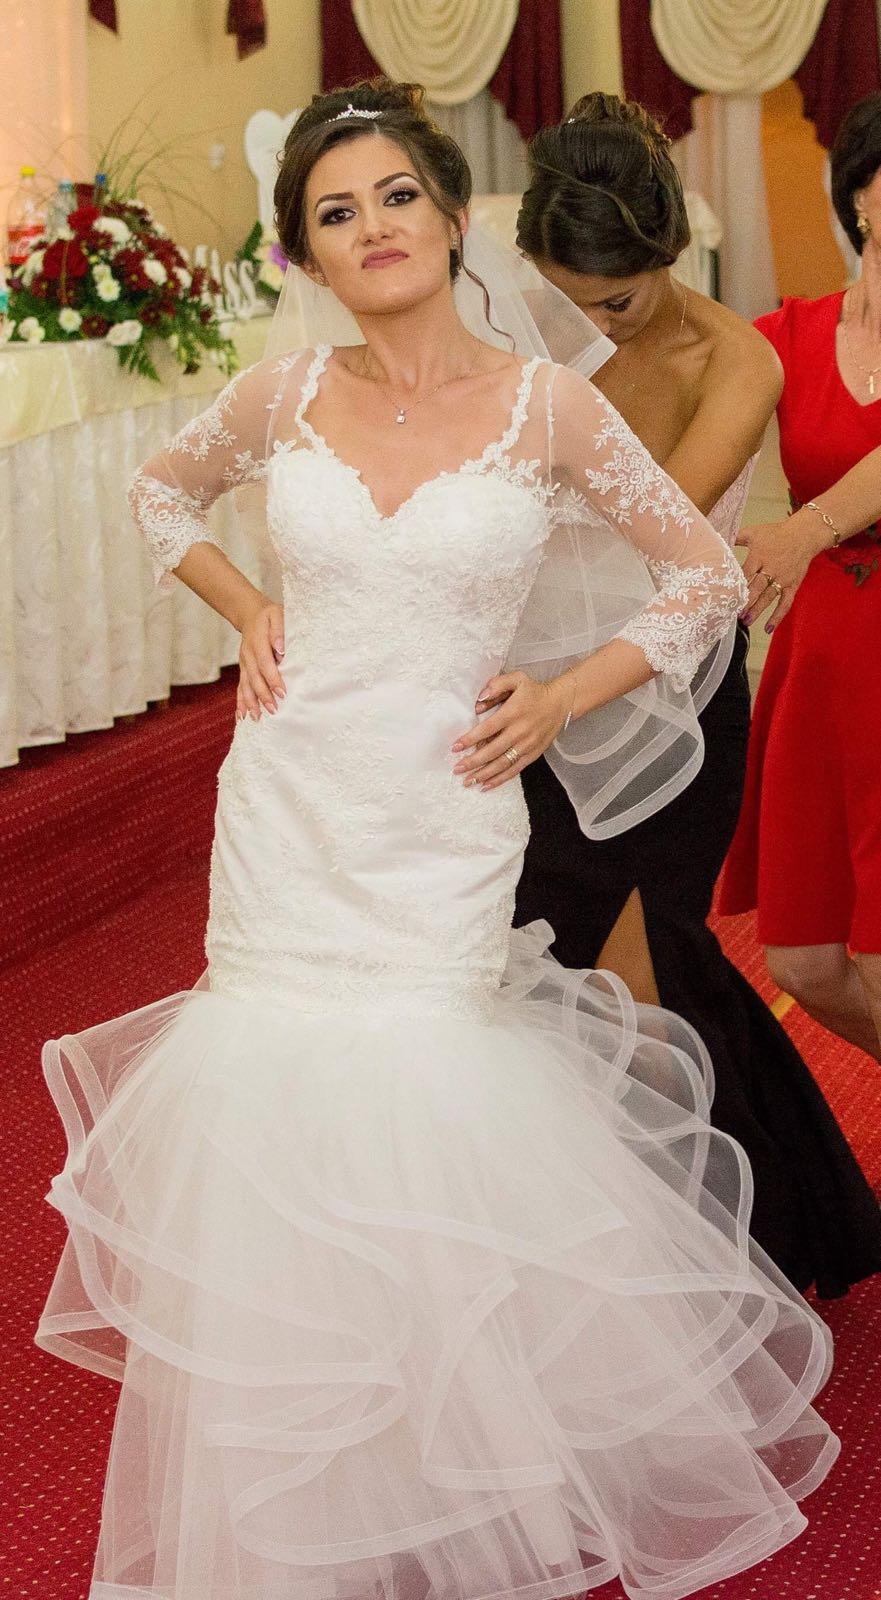 adriana beatrice rochia de mireasa 5 in 1 (4)